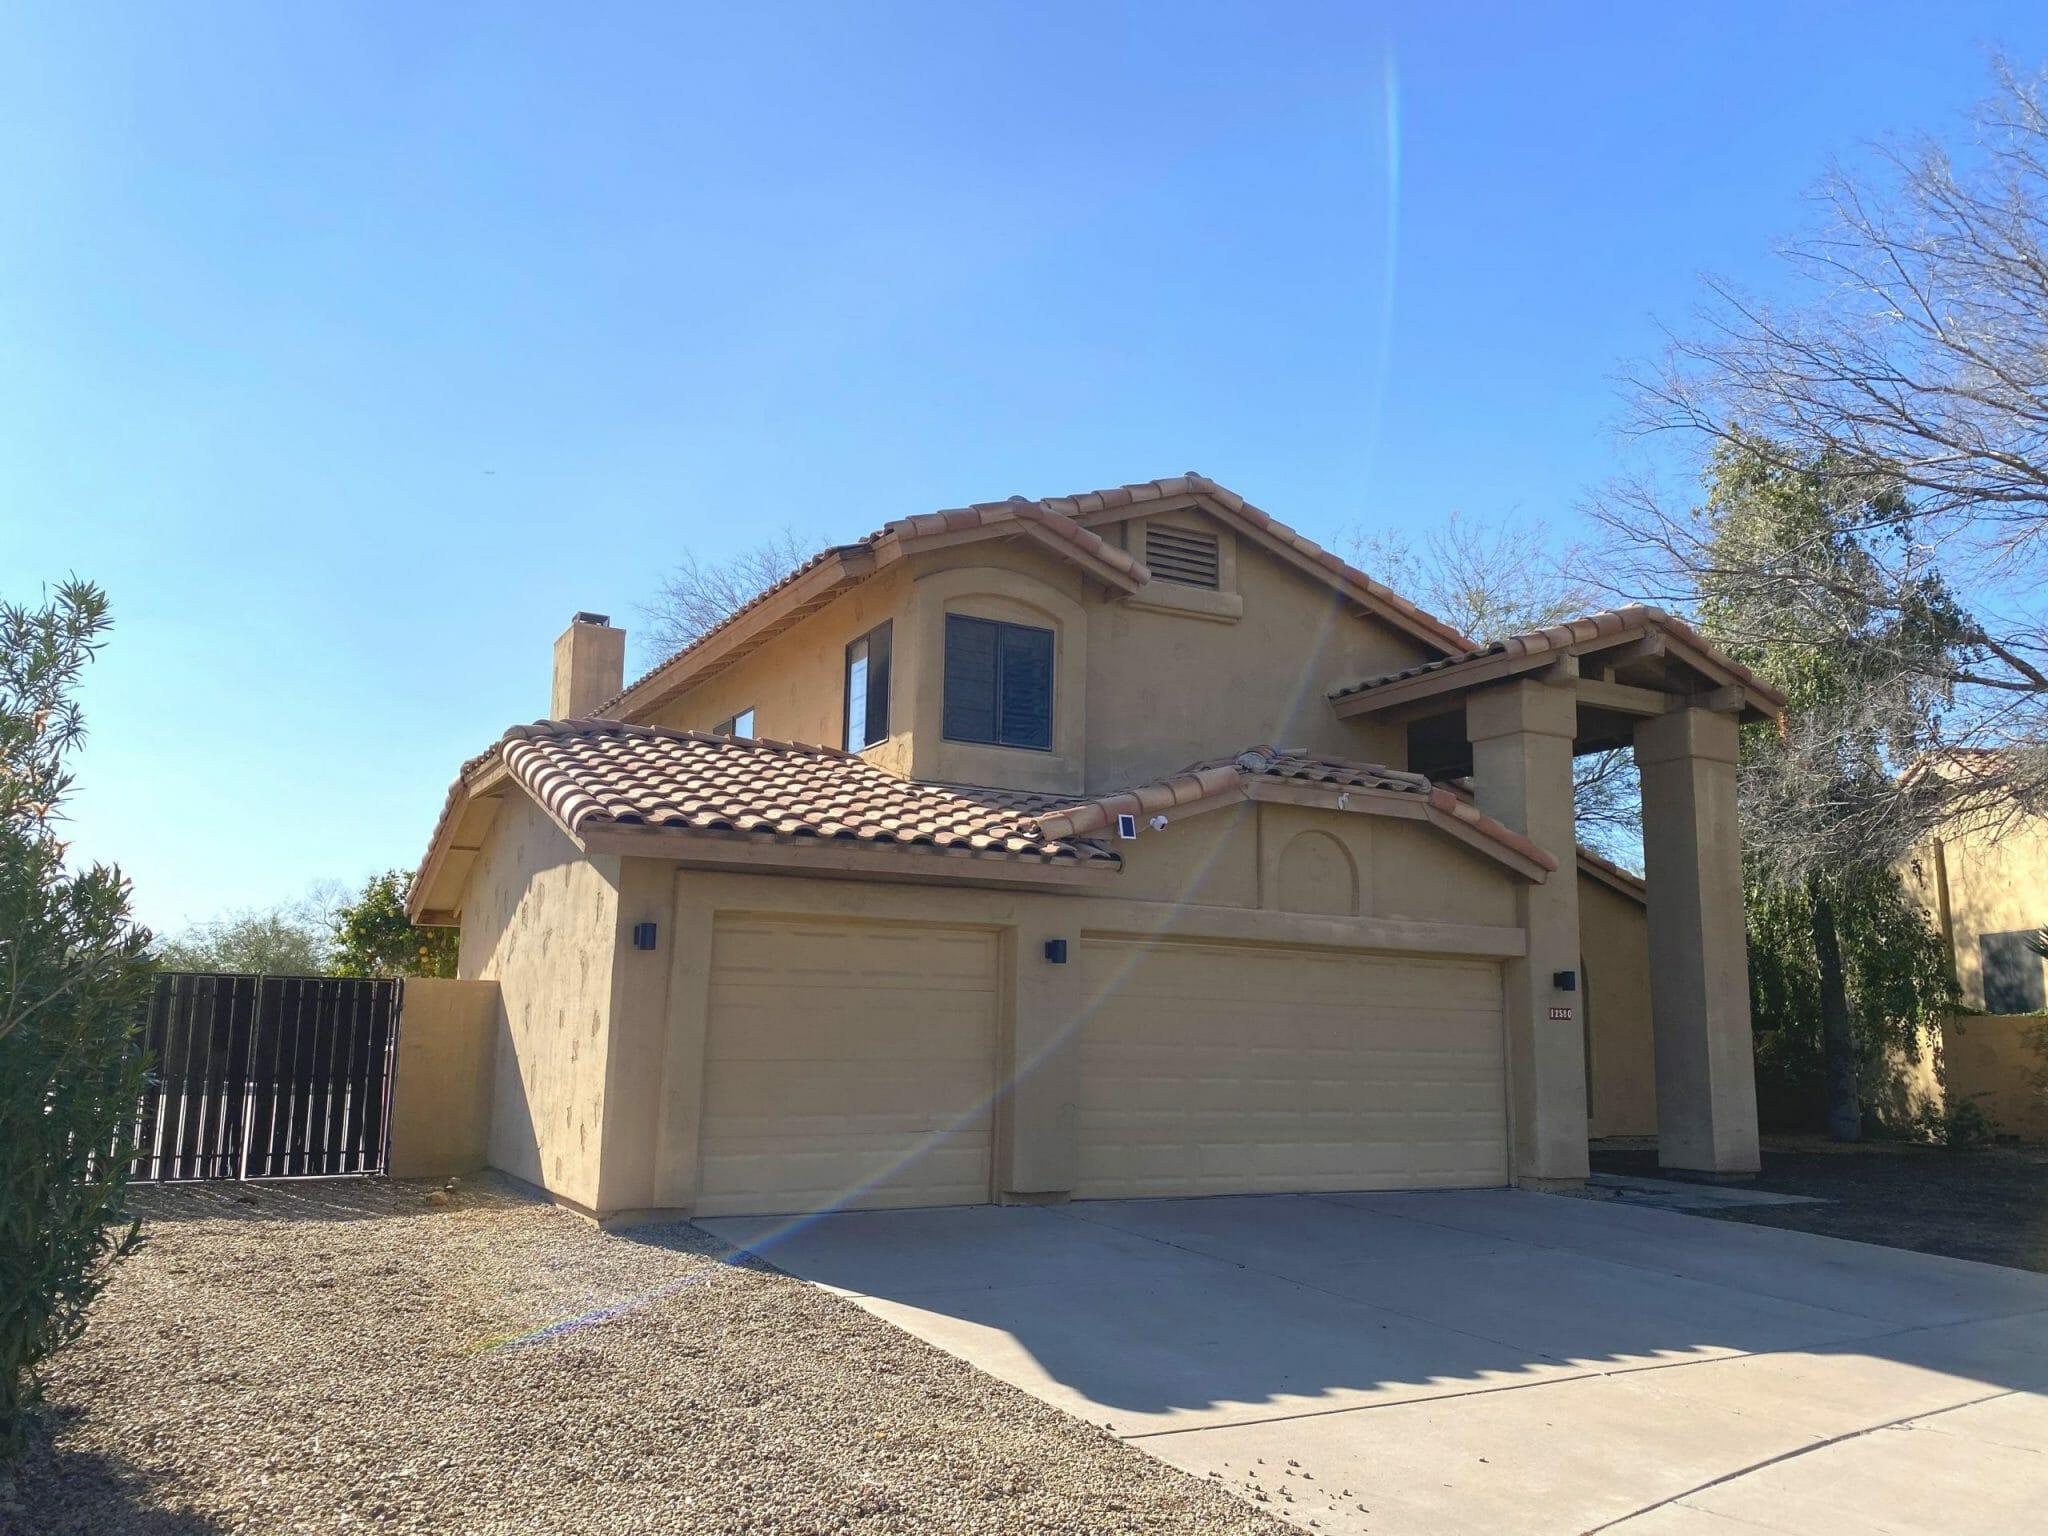 12580 N 92nd Pl, Scottsdale, AZ 85260